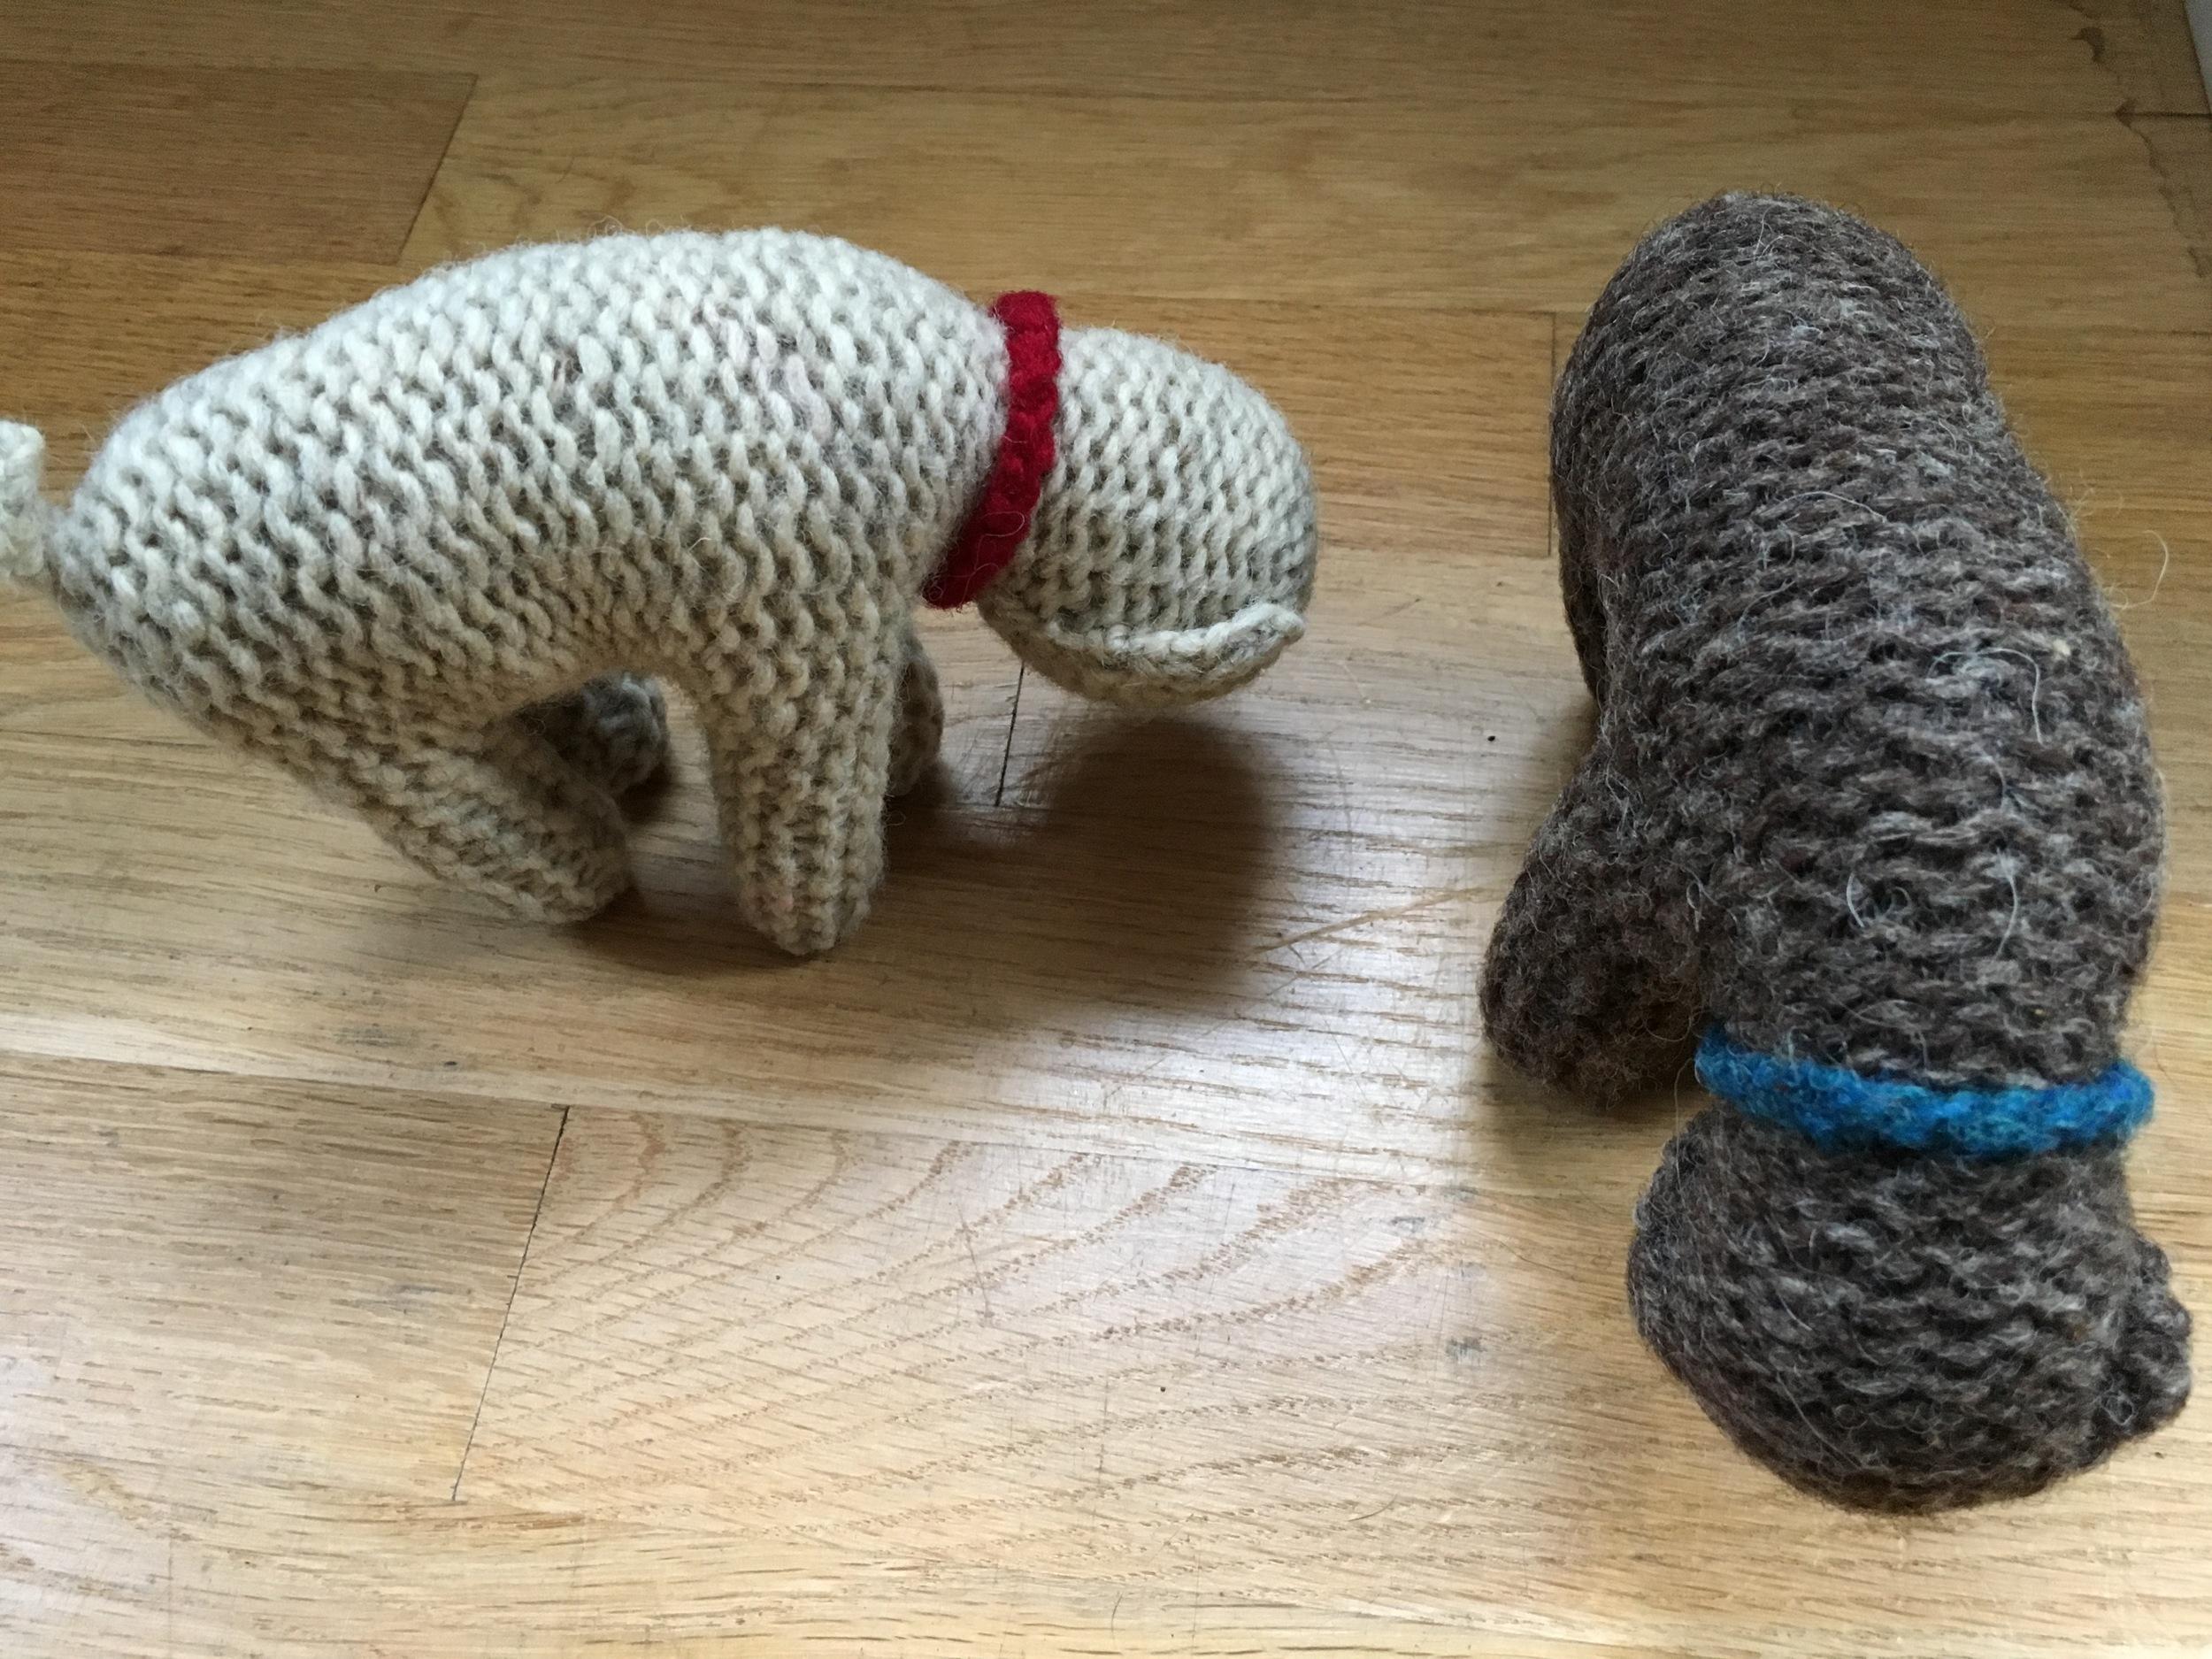 Christmas knitted sheep.jpg